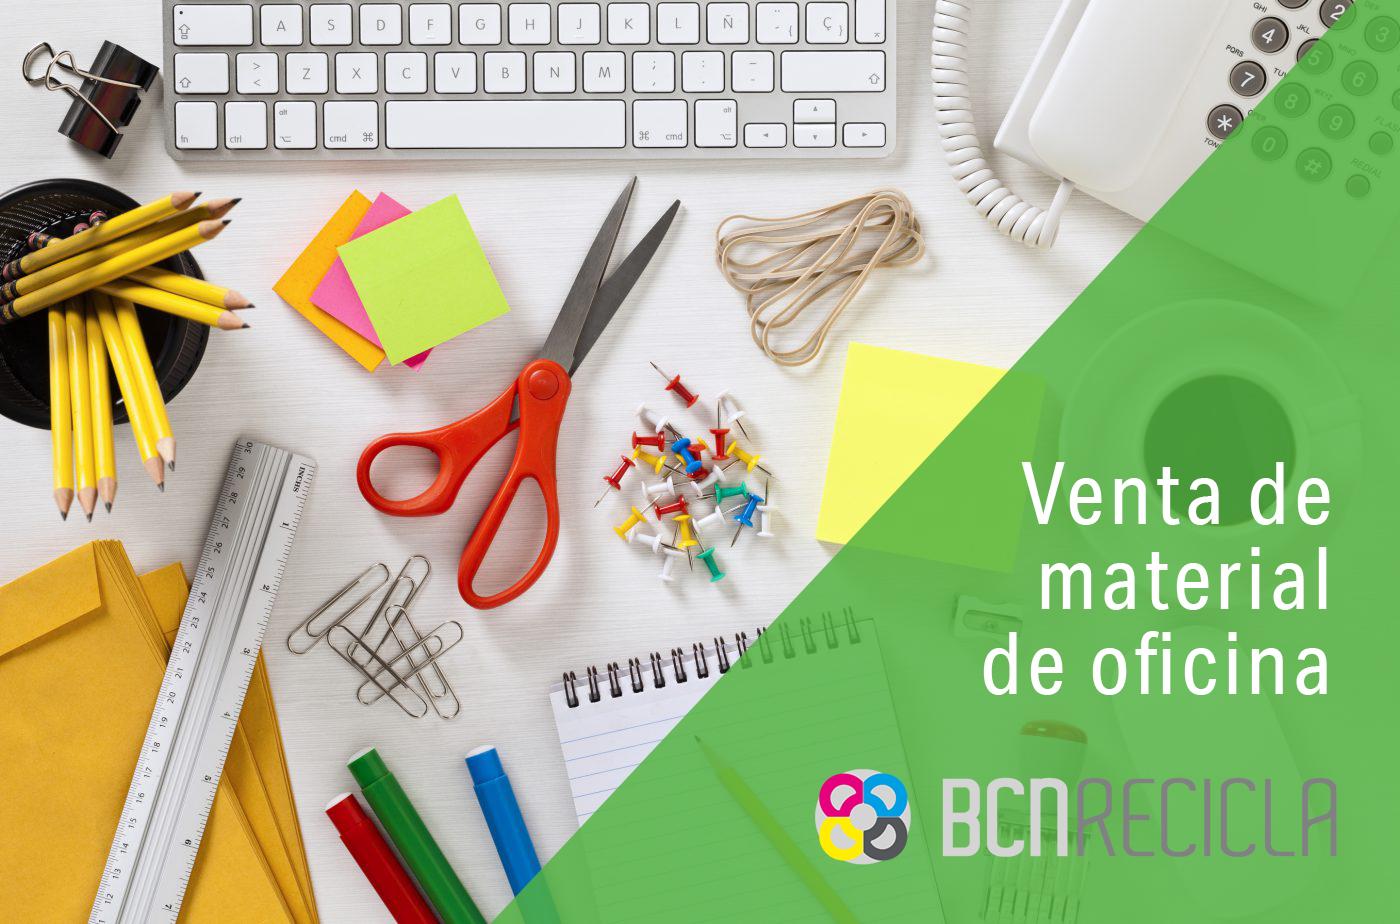 Venta de material de oficina en BCNRecicla!